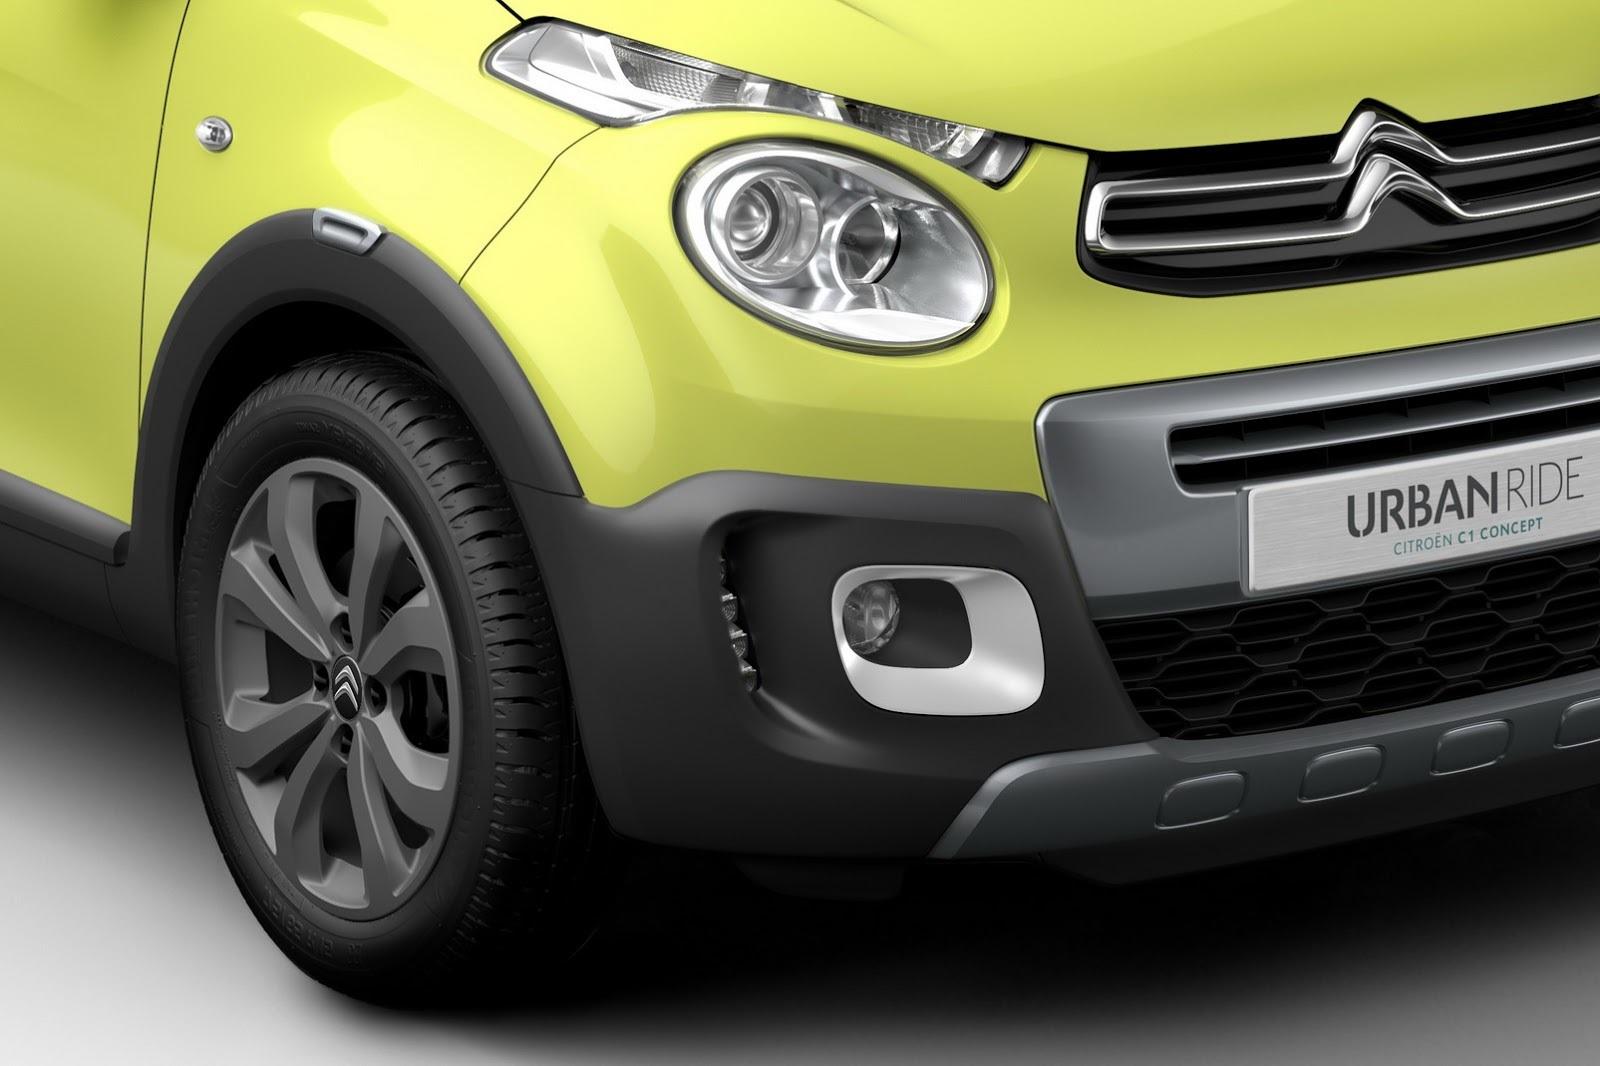 Foto de Citroën C1 Urban Ride Concept (7/8)